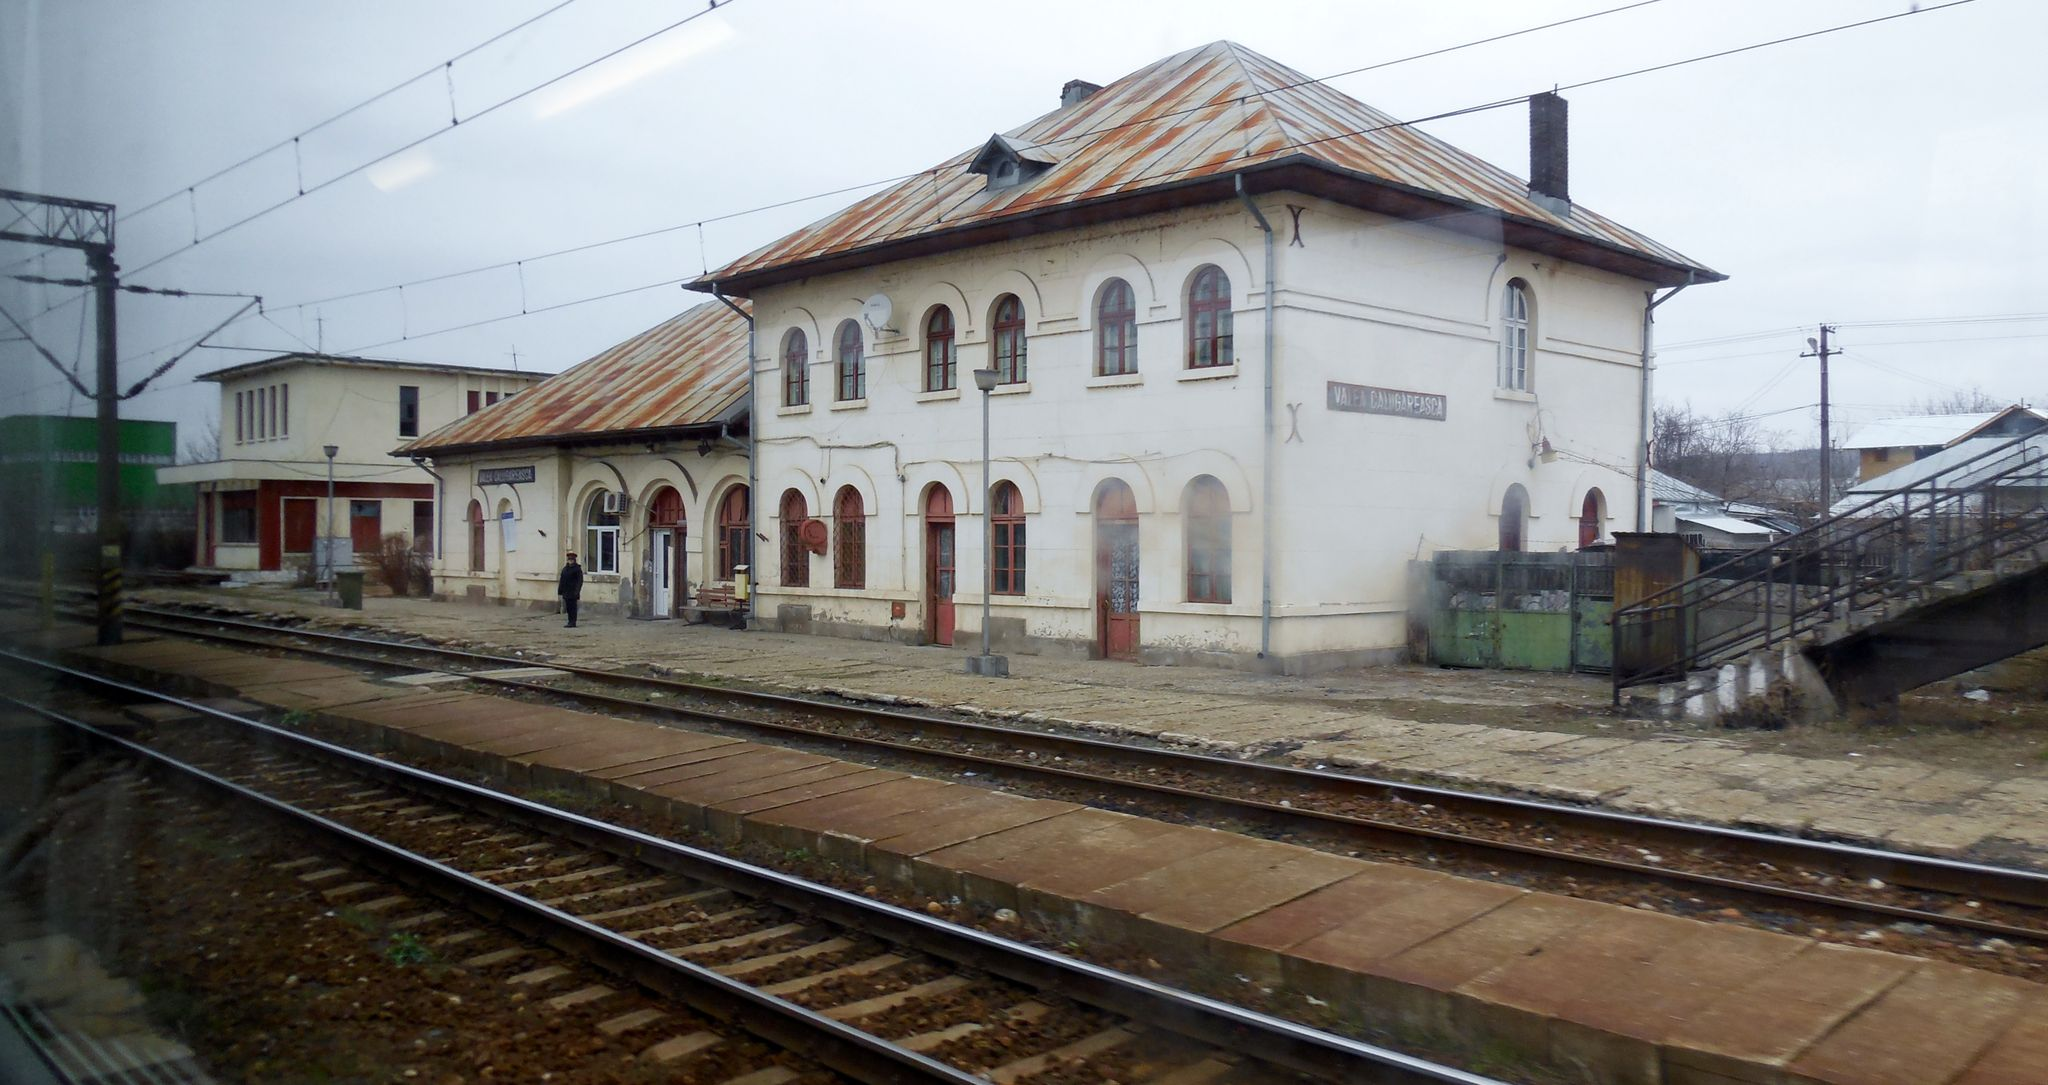 Valea Calugareascâ (Roumanie)